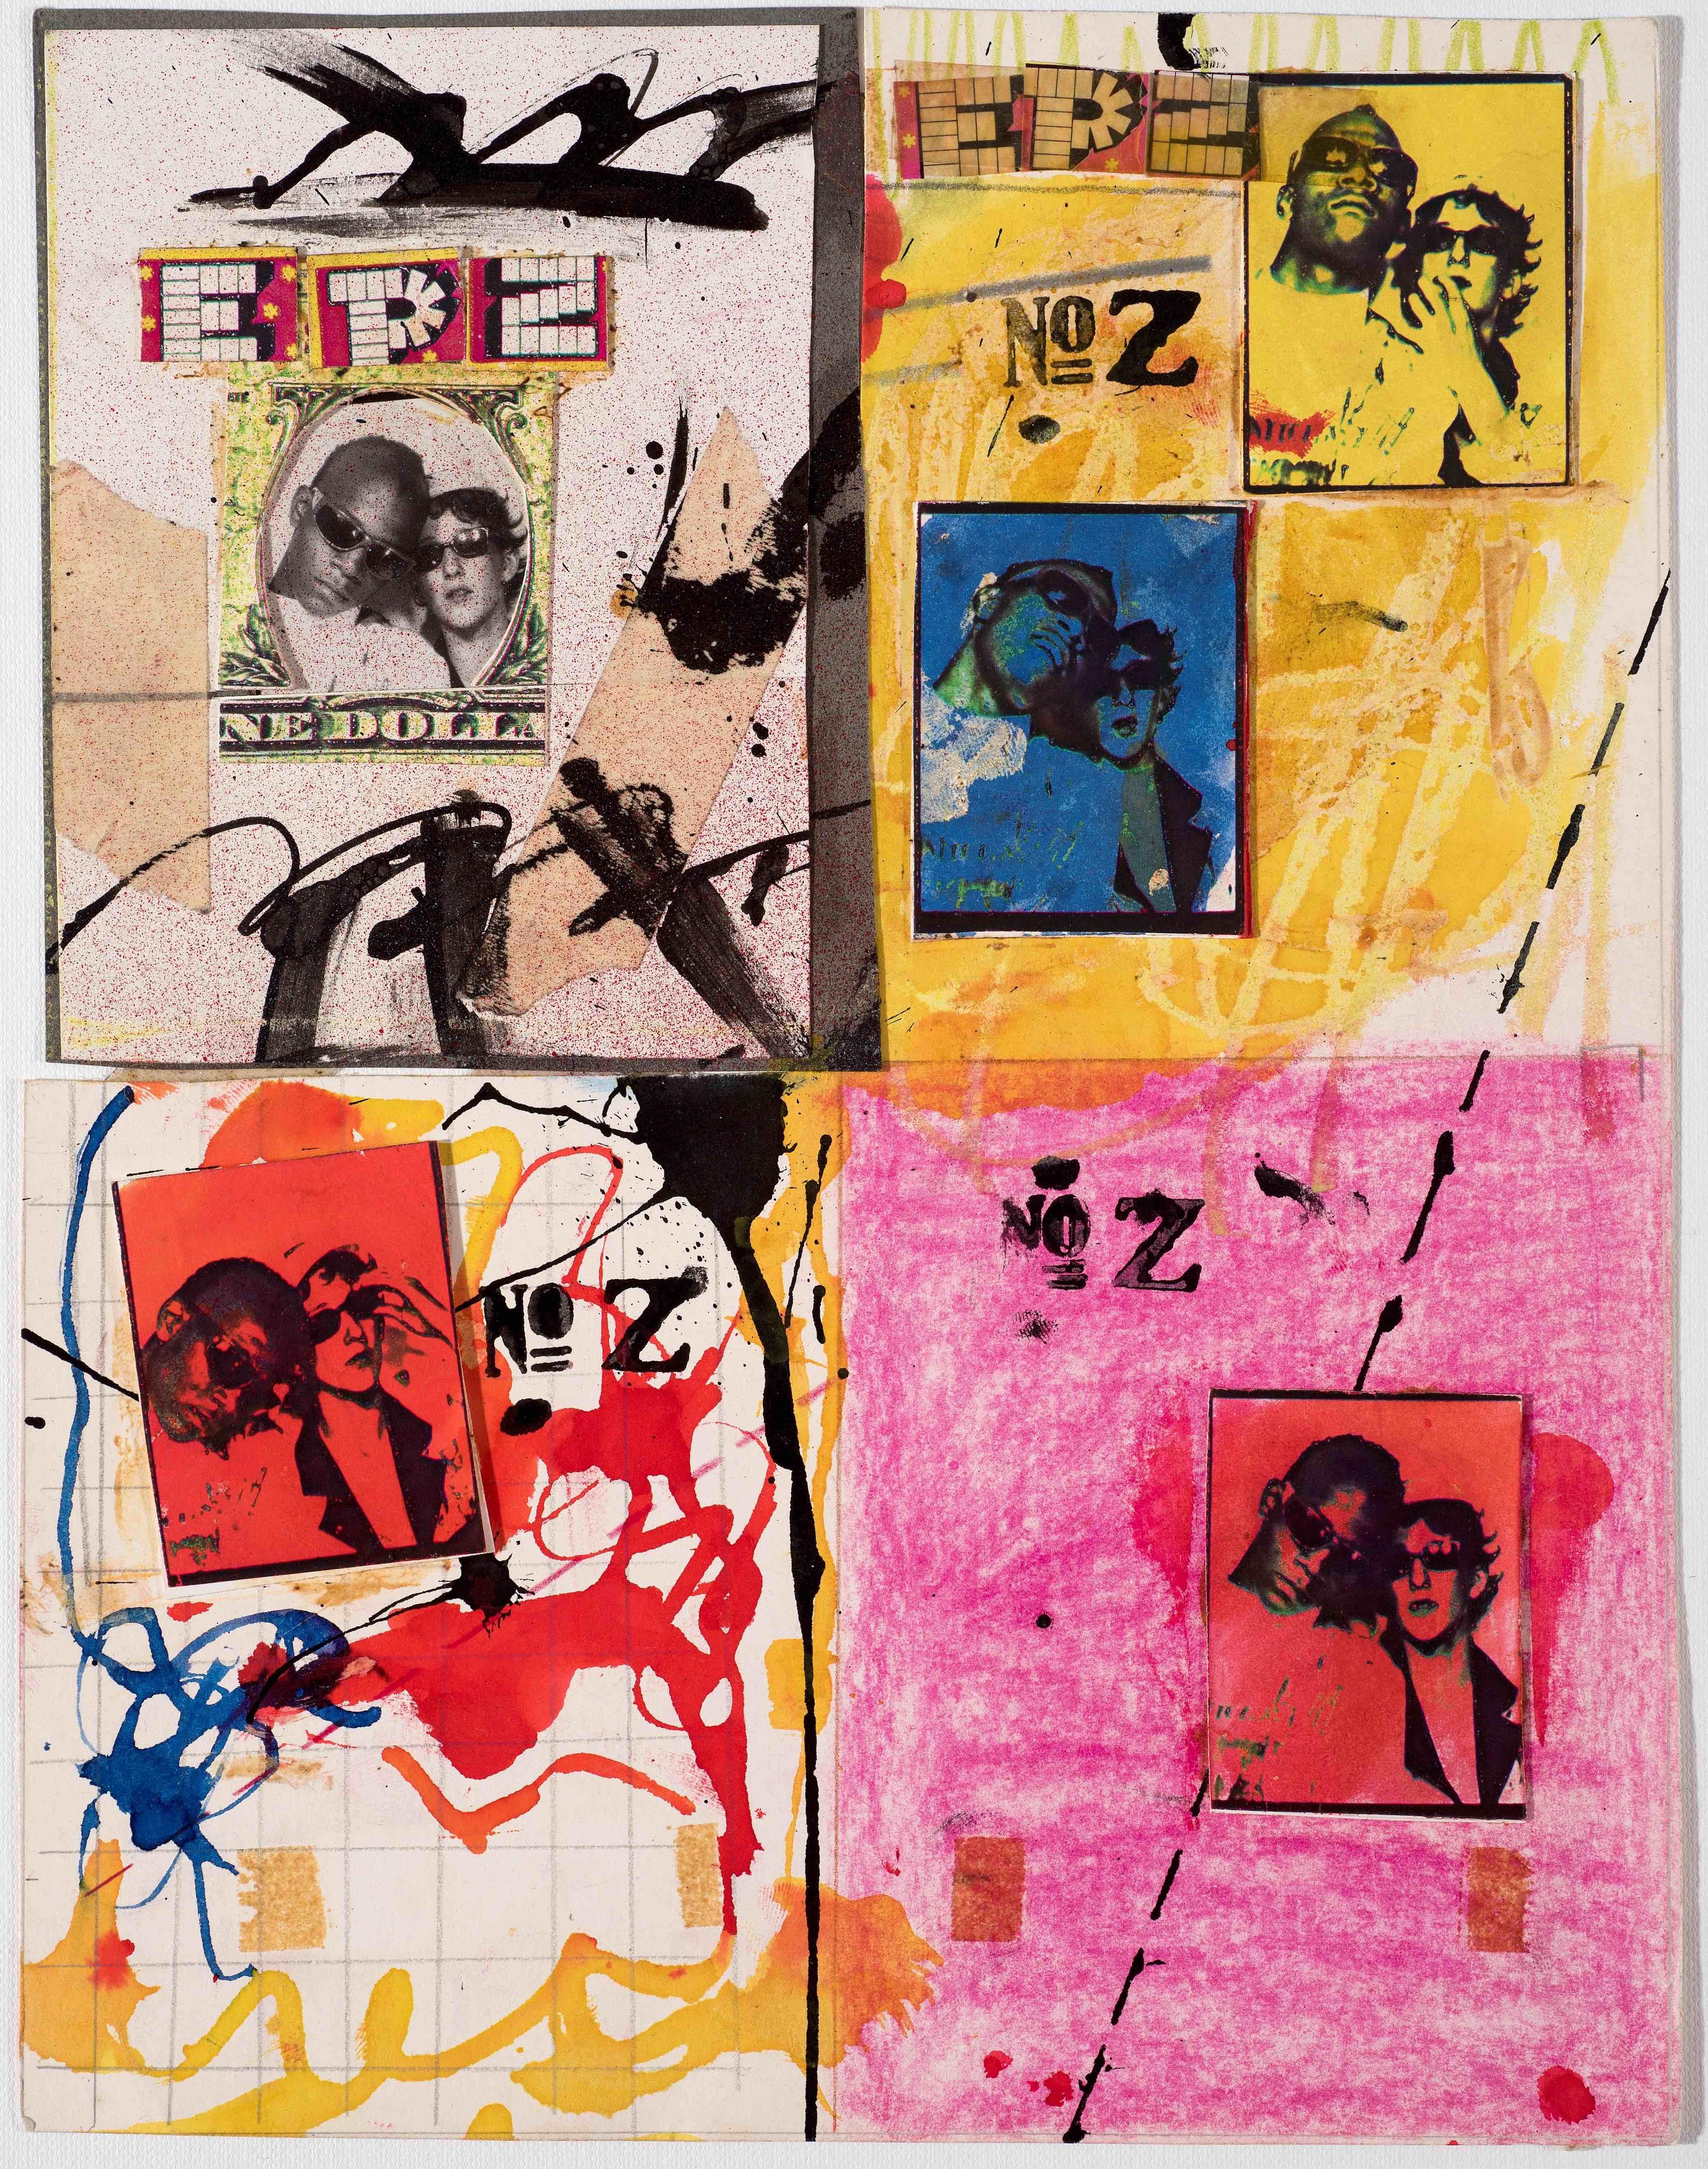 Jean-Michel Basquiat and Jennifer Stein Anti-Baseball Card Product, 1979 Courtesy Jennifer Von Holstein. © Jennifer Von Holstein and The Estate of Jean-Michel Basquiat. Licensed by Artestar, New York.